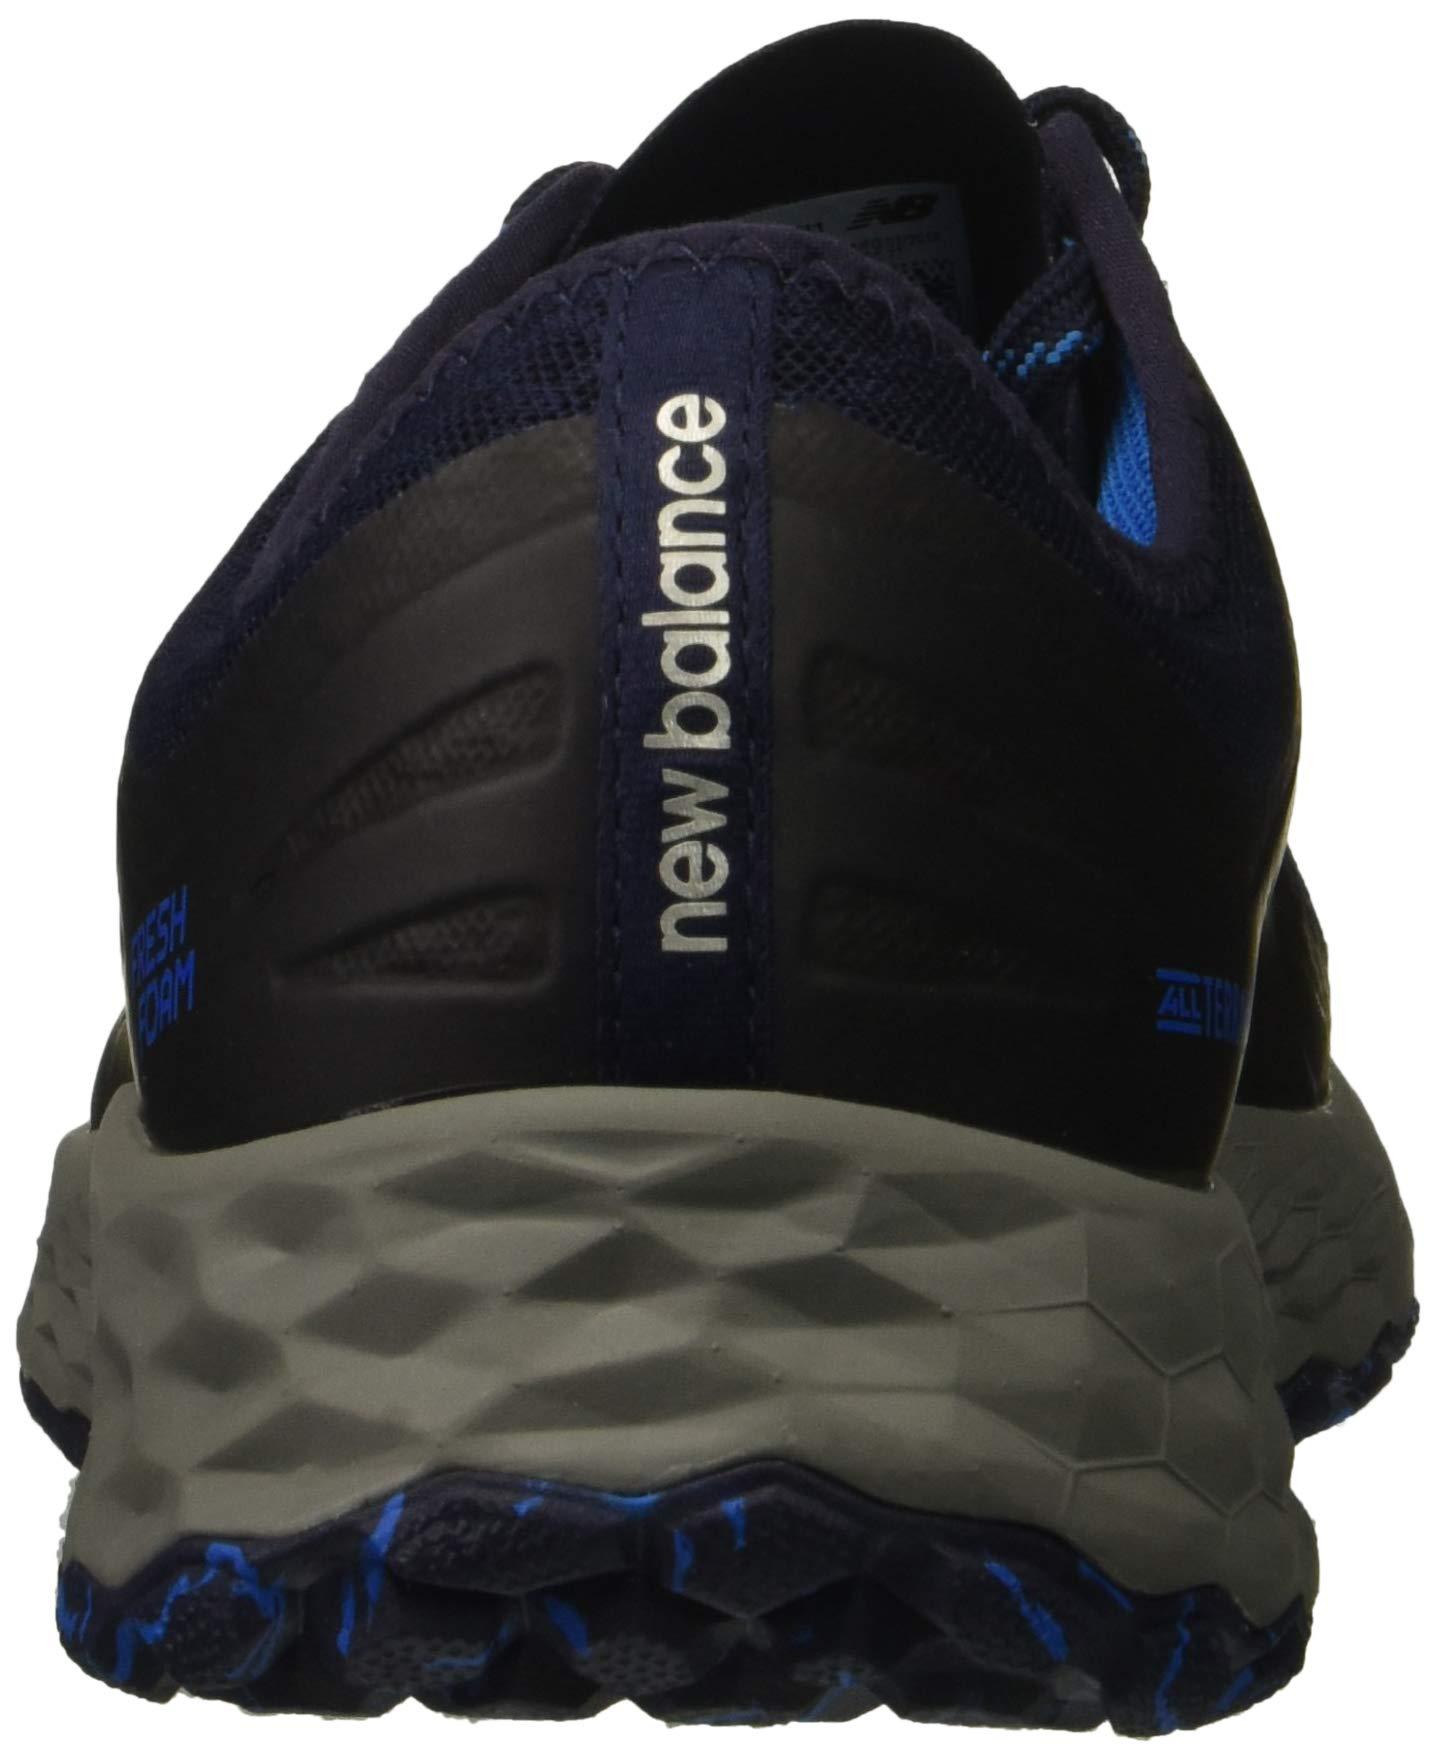 New Balance Men's Kaymin V1 Fresh Foam Trail Running Shoe Pigment/Laser Blue 1.5 D US by New Balance (Image #2)